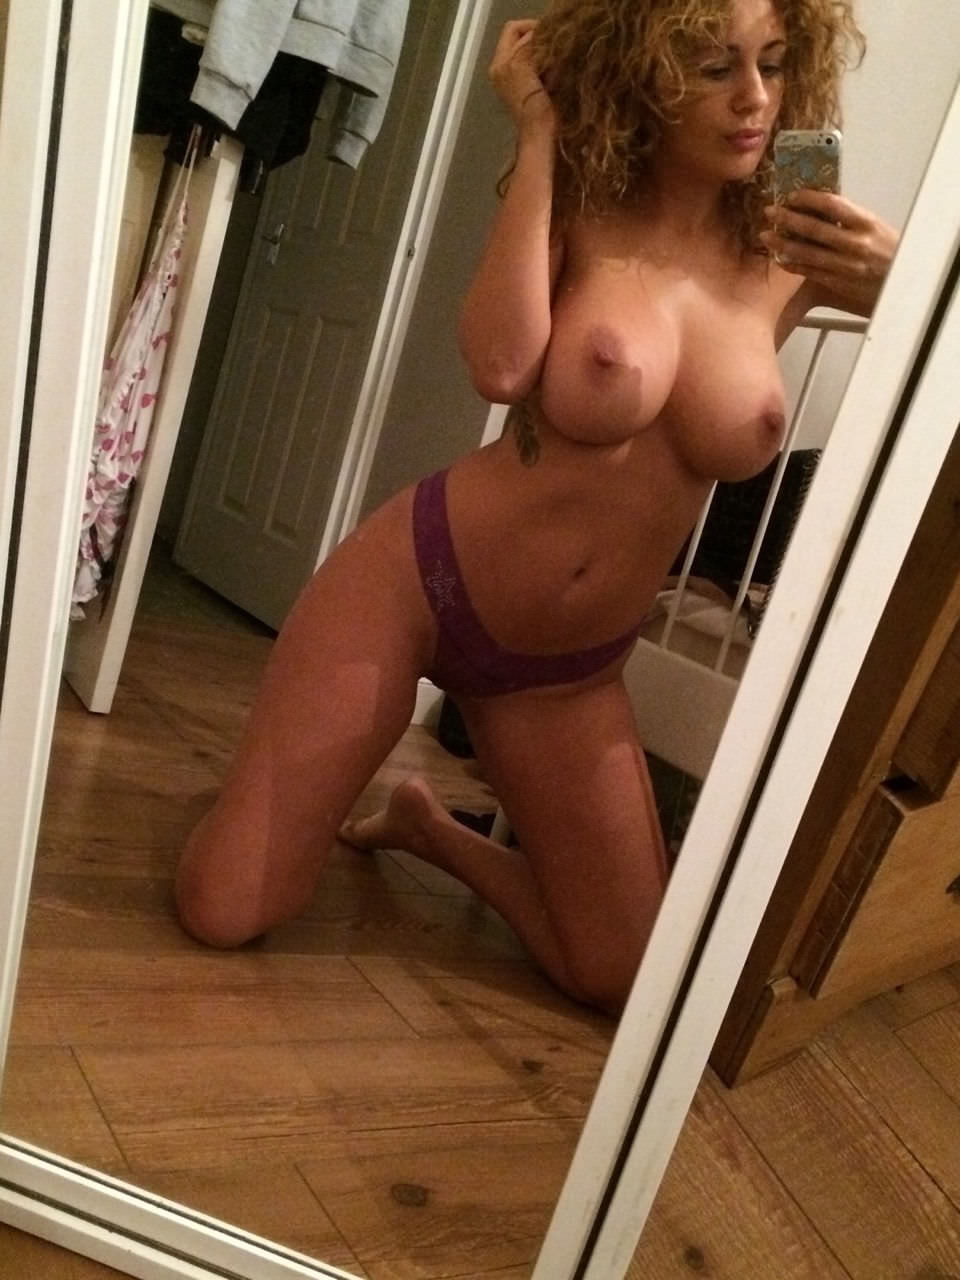 Holly Peers Nude Photos 0026